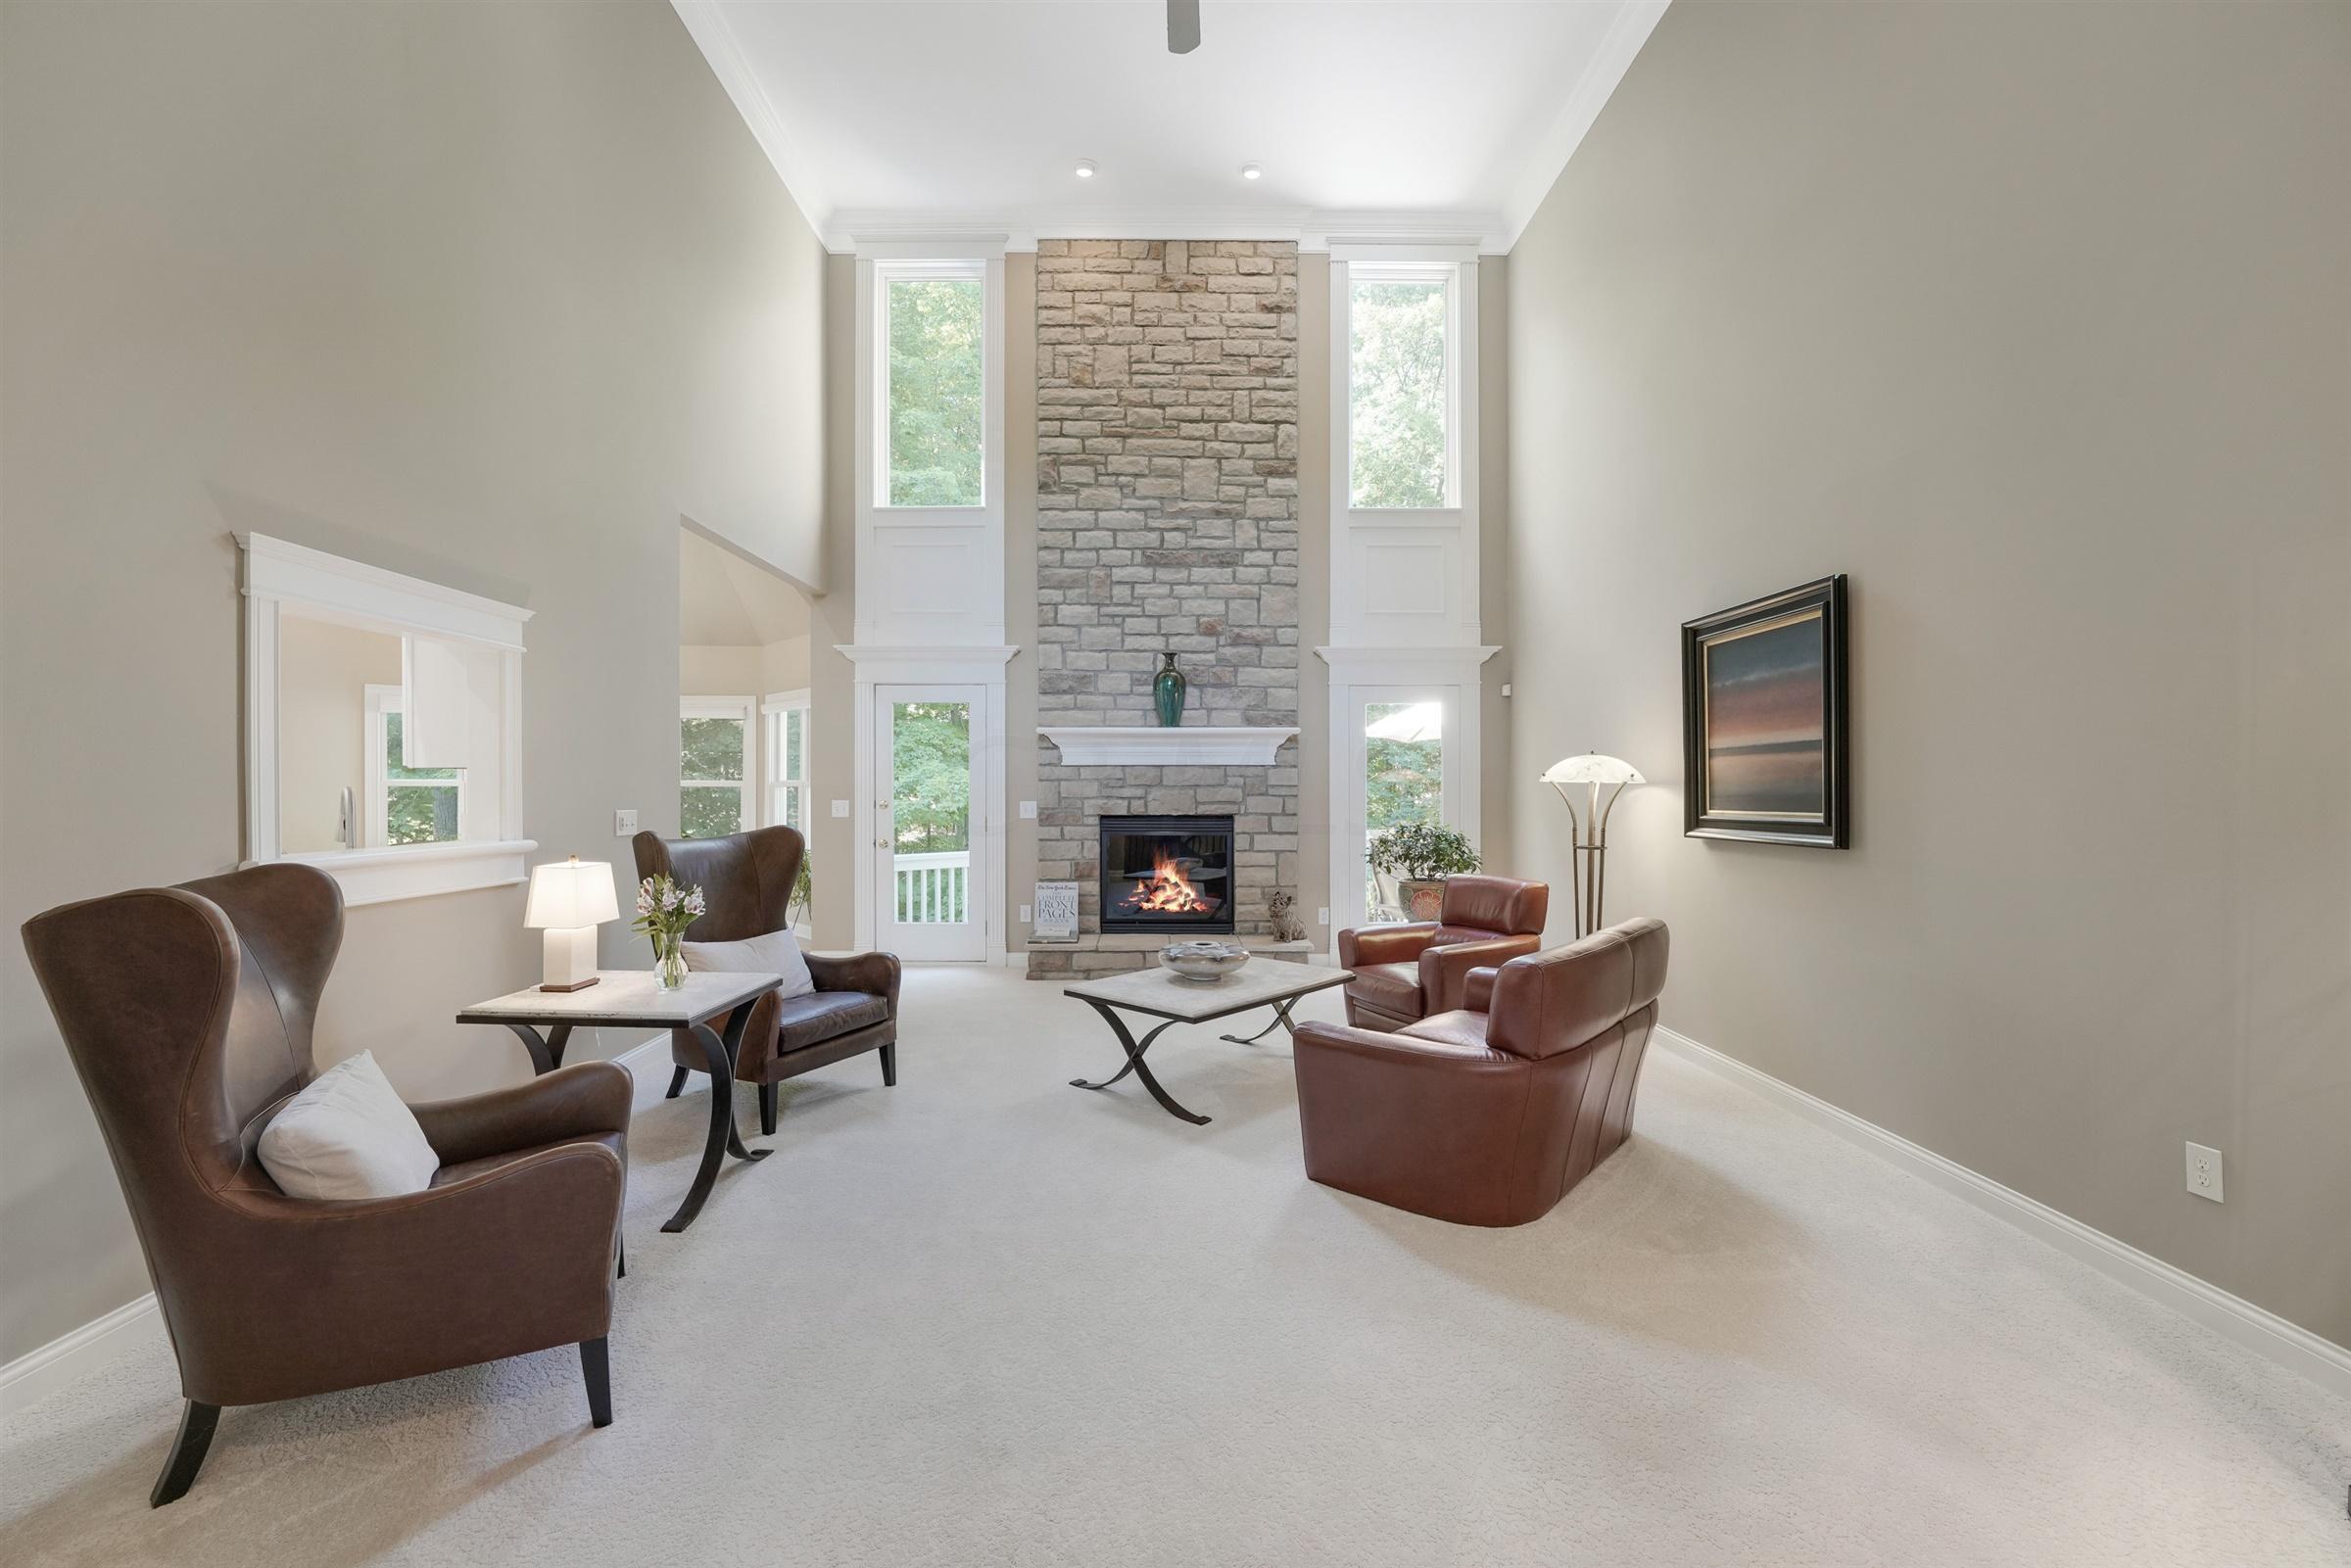 551 Riverbend Avenue, Powell, Ohio 43065, 5 Bedrooms Bedrooms, ,5 BathroomsBathrooms,Residential,For Sale,Riverbend,220025592